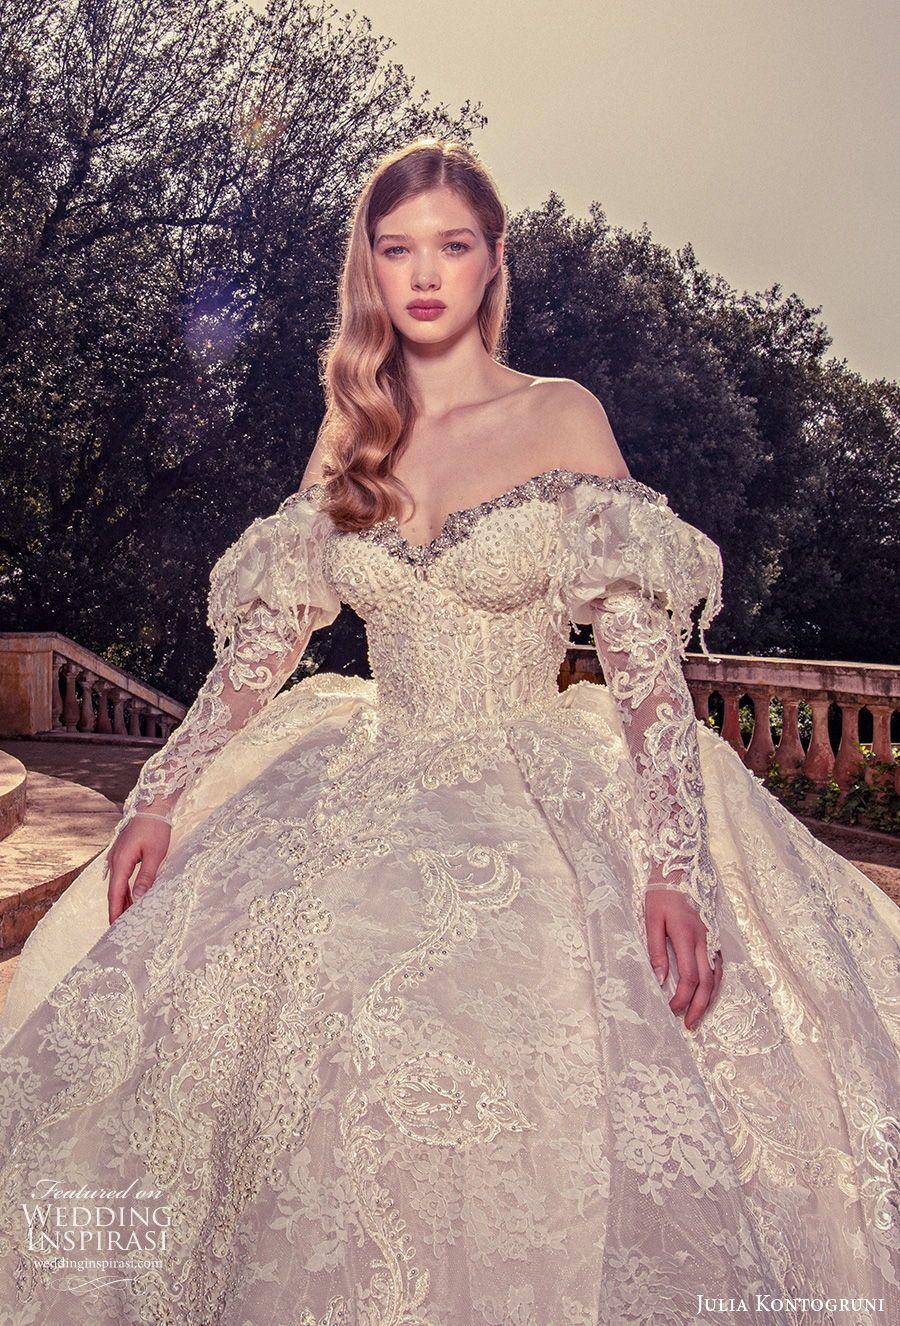 Julia Kontogruni 2020 Wedding Dresses Wedding Inspirasi Wedding Dresses Vintage Princess Wedding Dresses Under 500 Wedding Dresses Corset [ 1326 x 900 Pixel ]